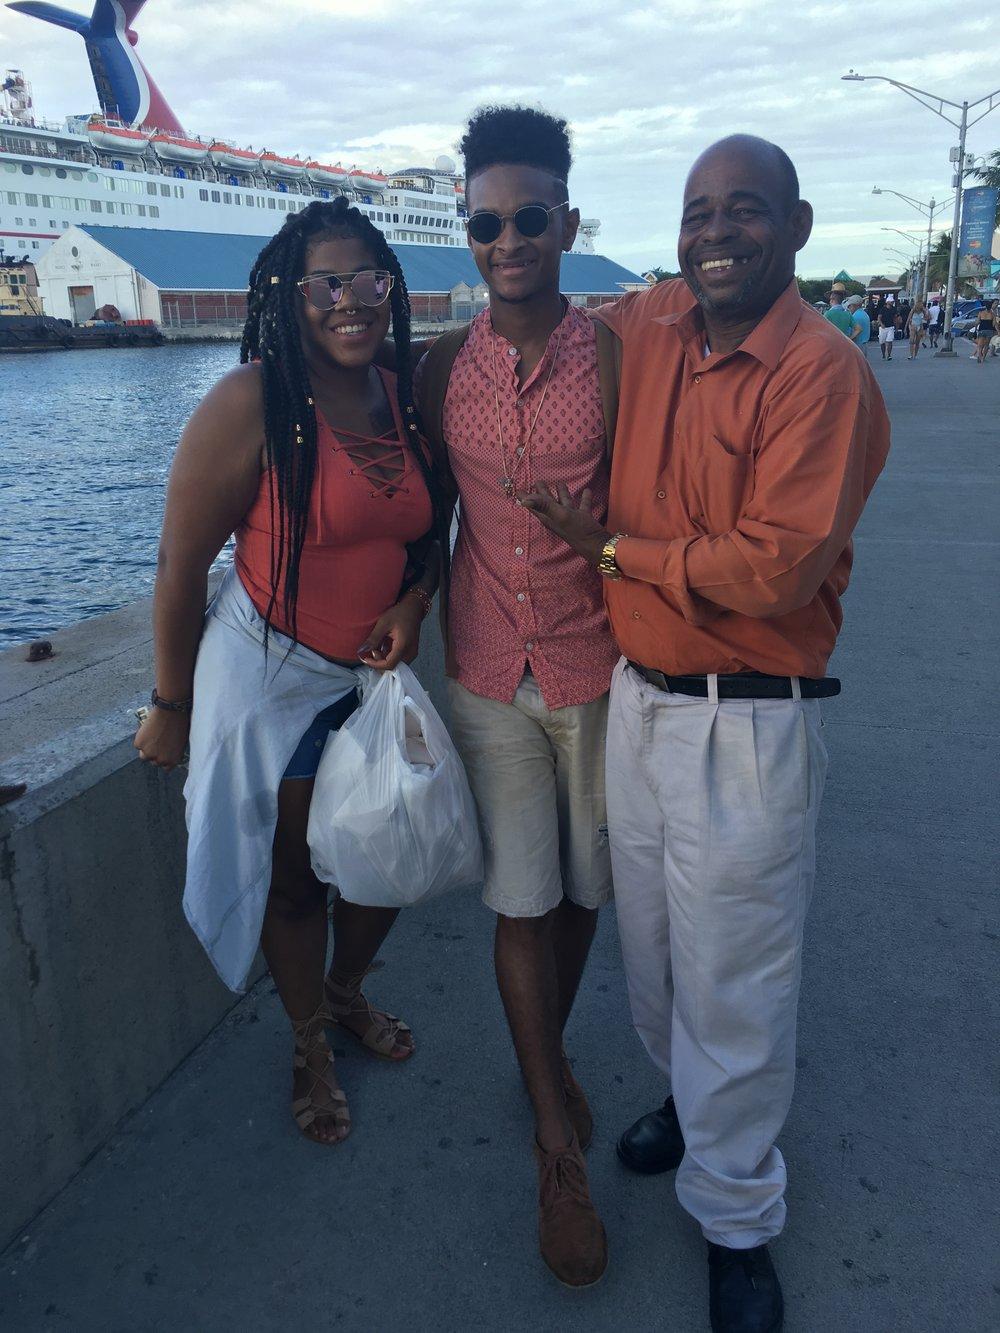 cruise bahamas royal carribean travel discount cheap mom blog motherhood savvy mom working mother